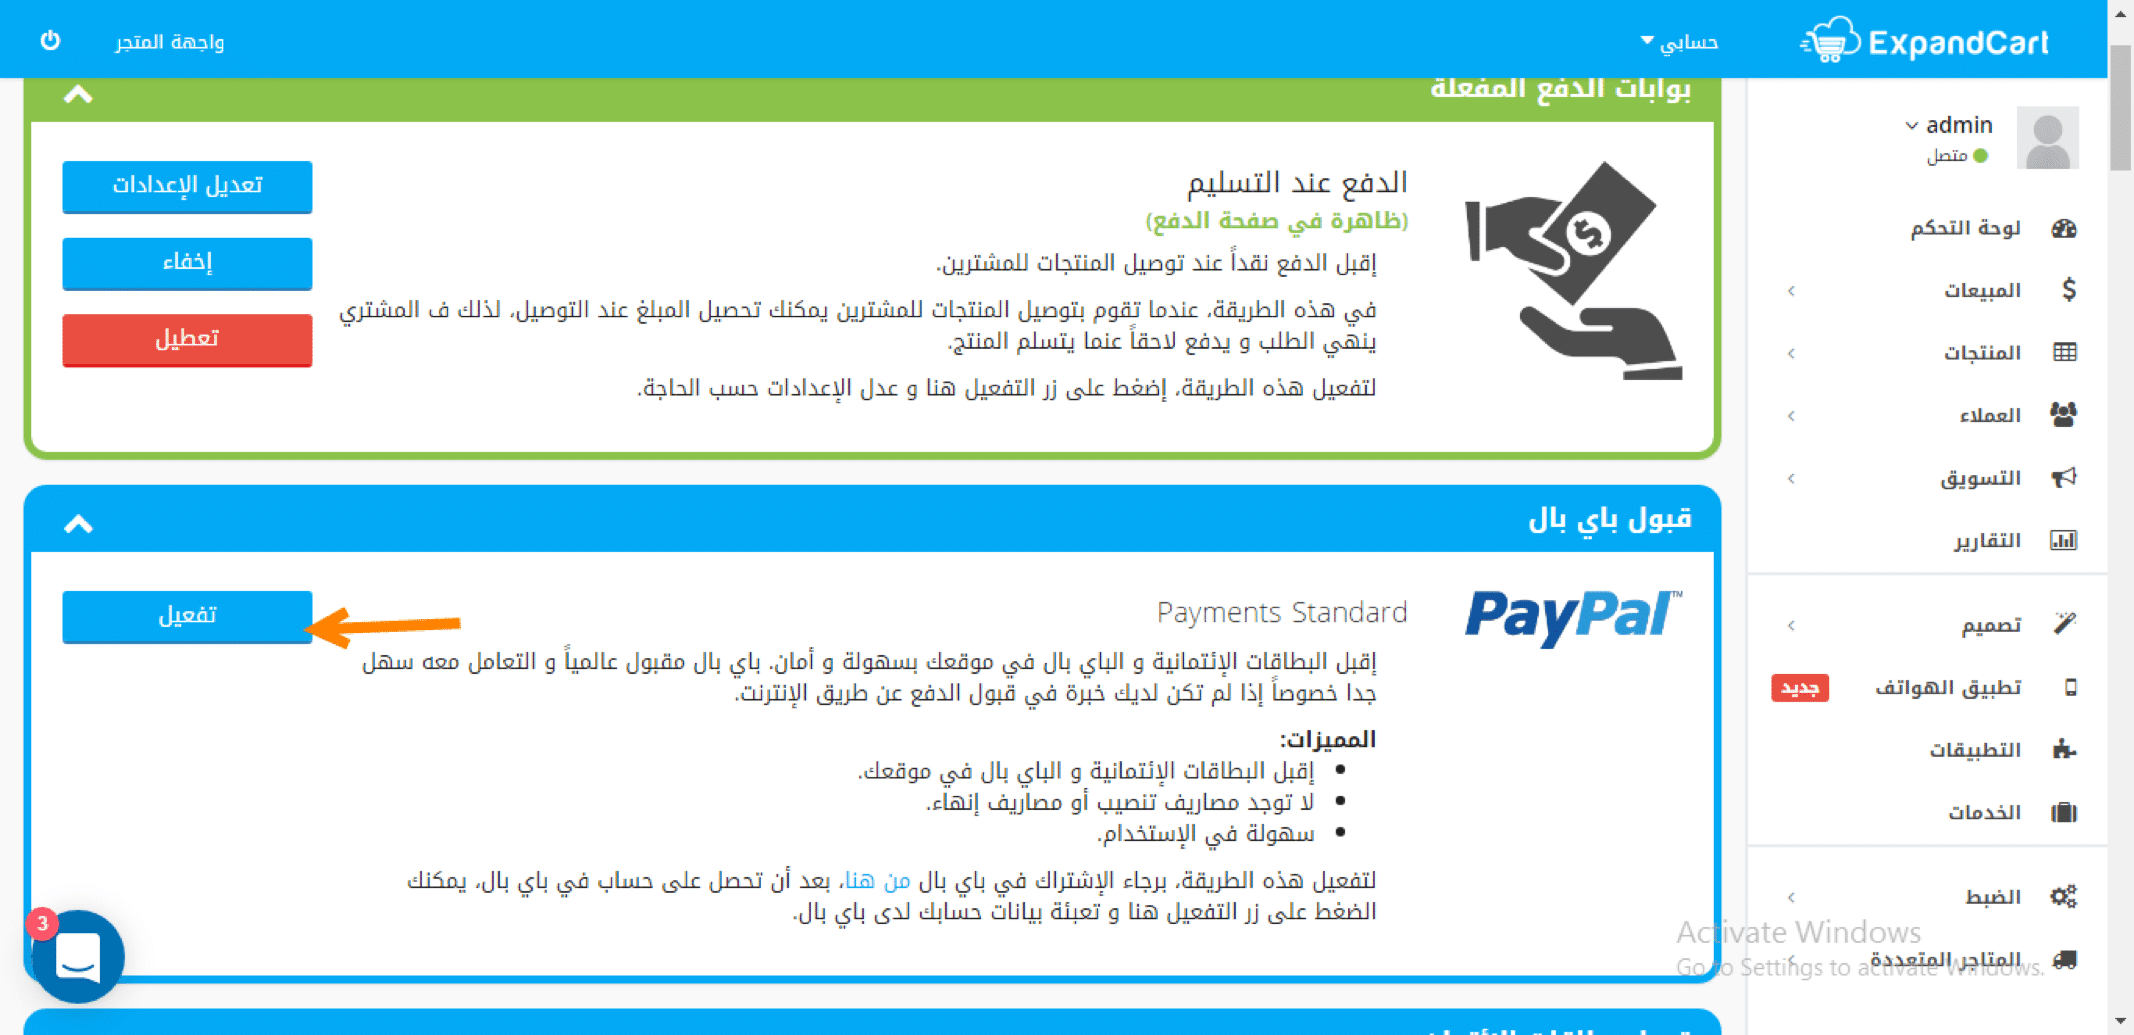 paypal_expandcart